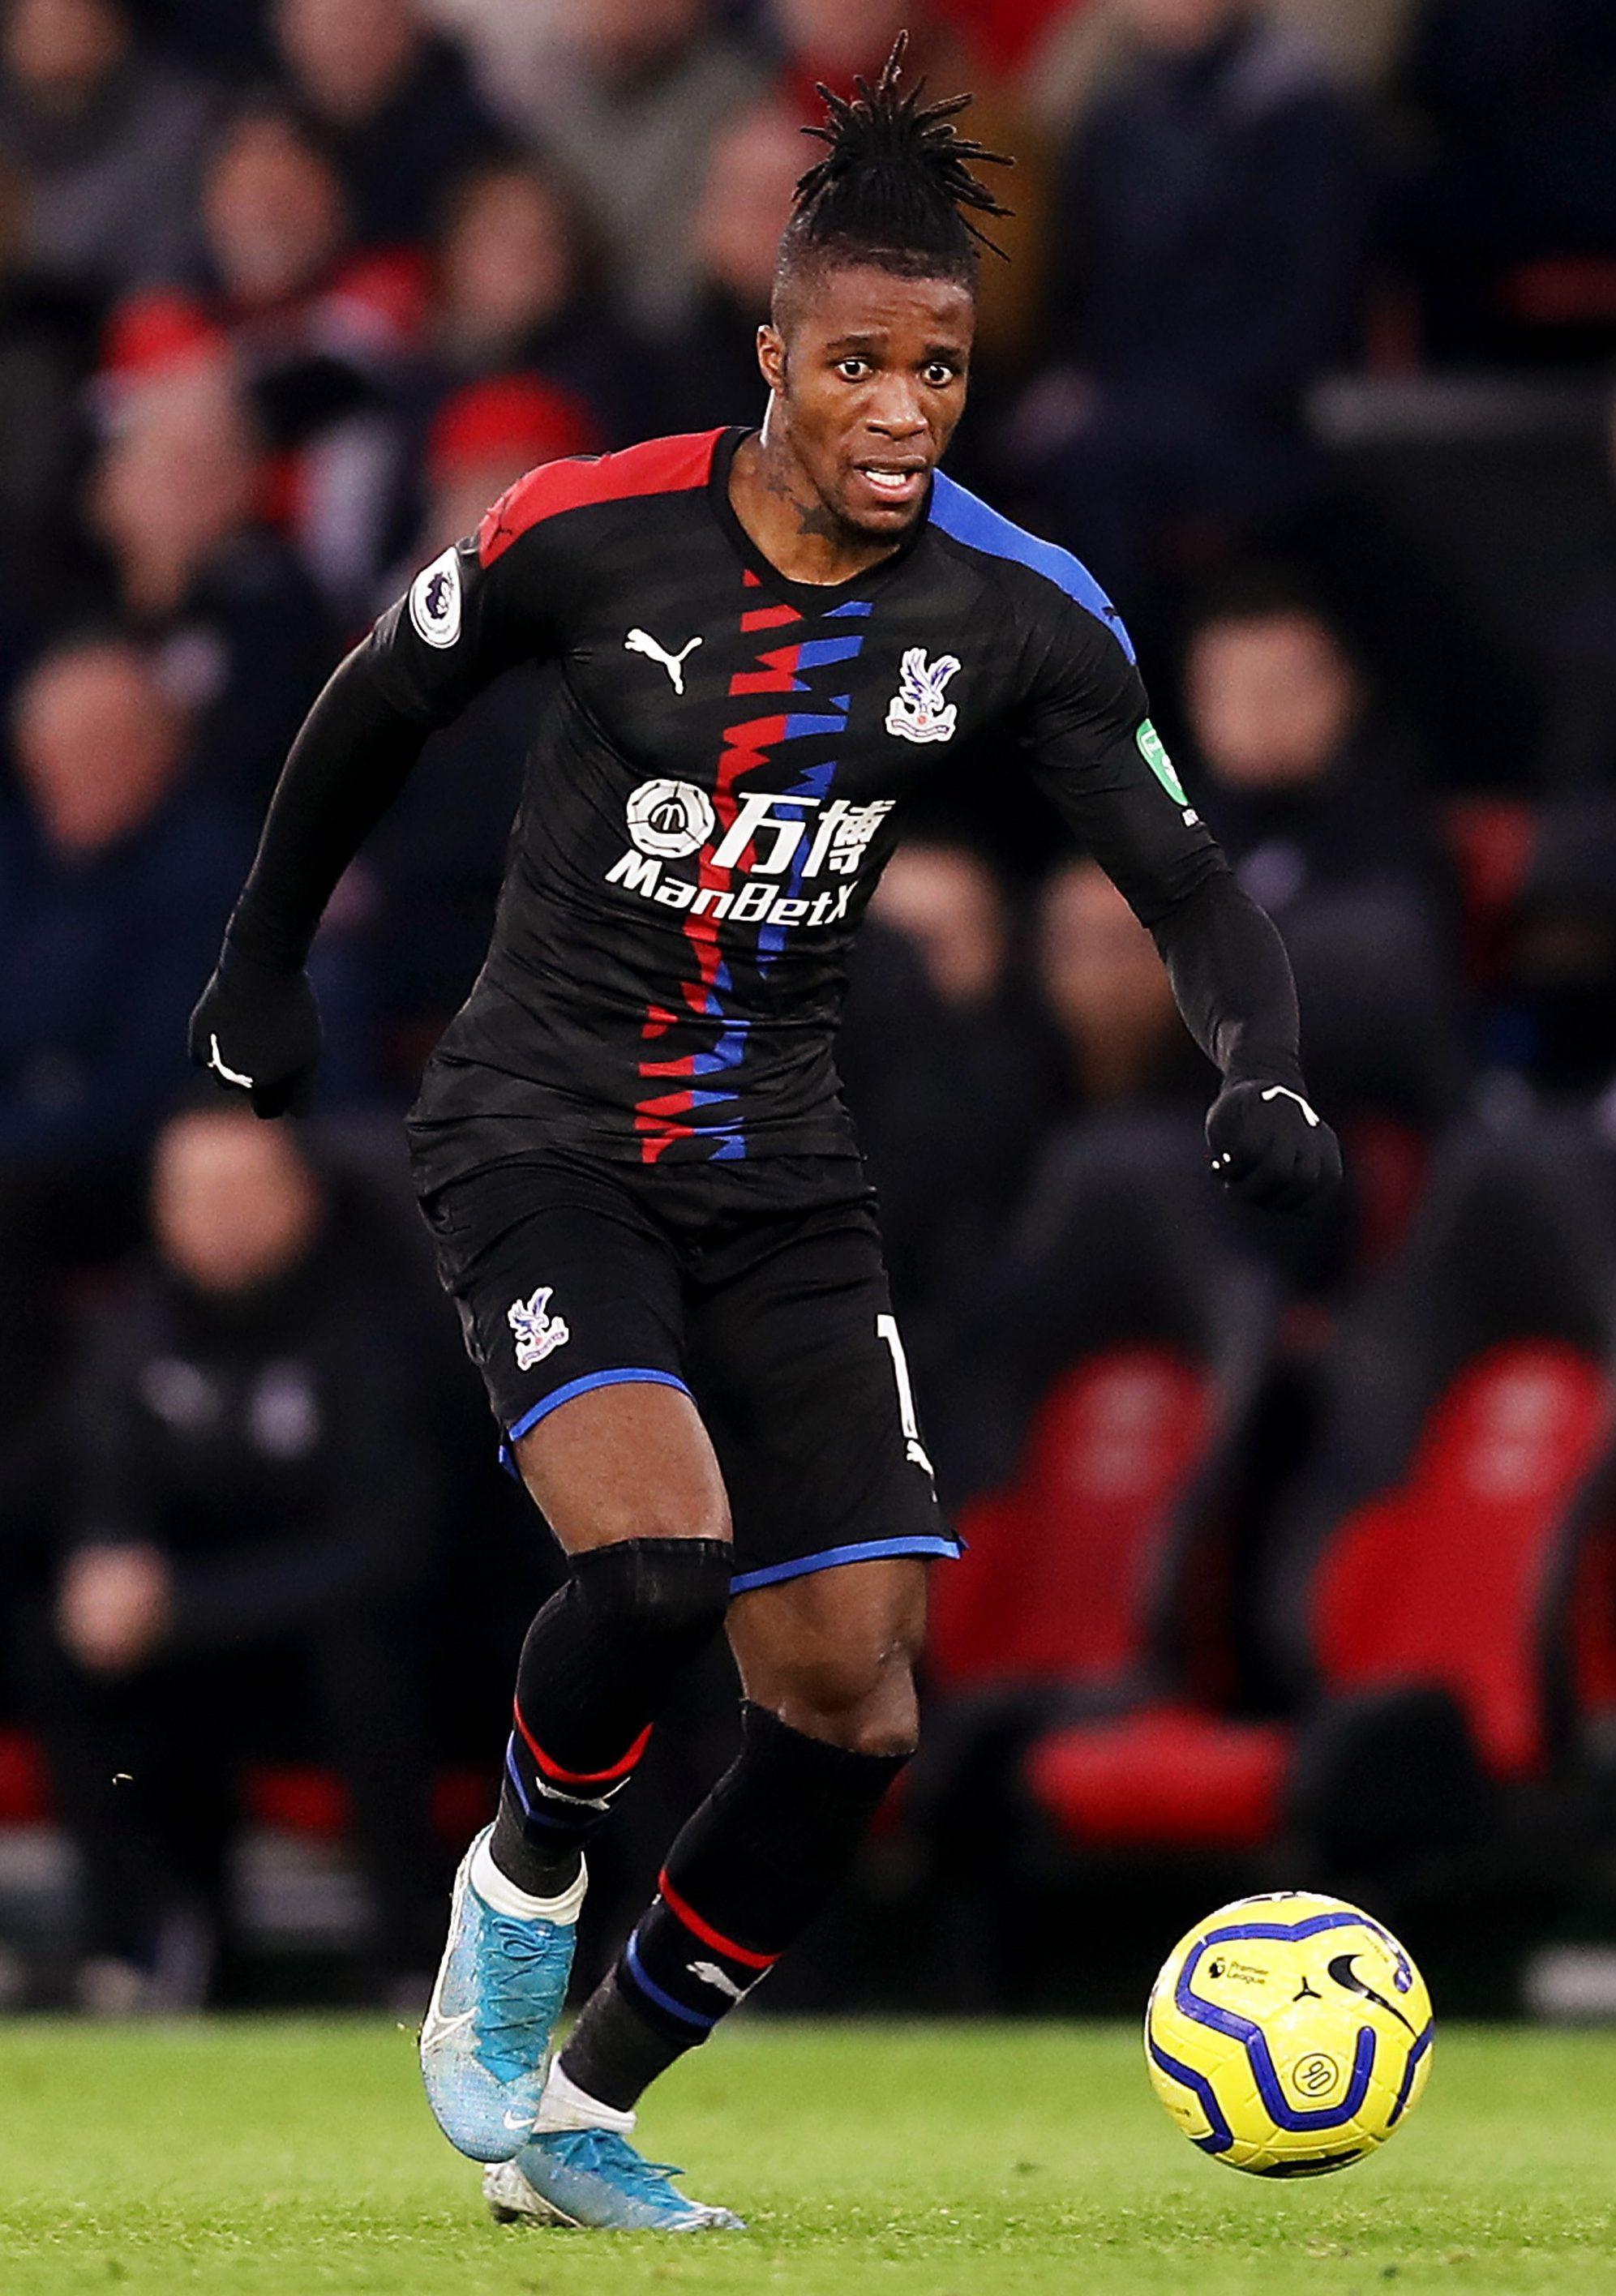 Wilfried Zaha remains Chelsea's top transfer target but Blues will not pay £80m asking price扎哈仍然是切尔西的头号转会目标,但蓝军不会支付8000万英镑的开价